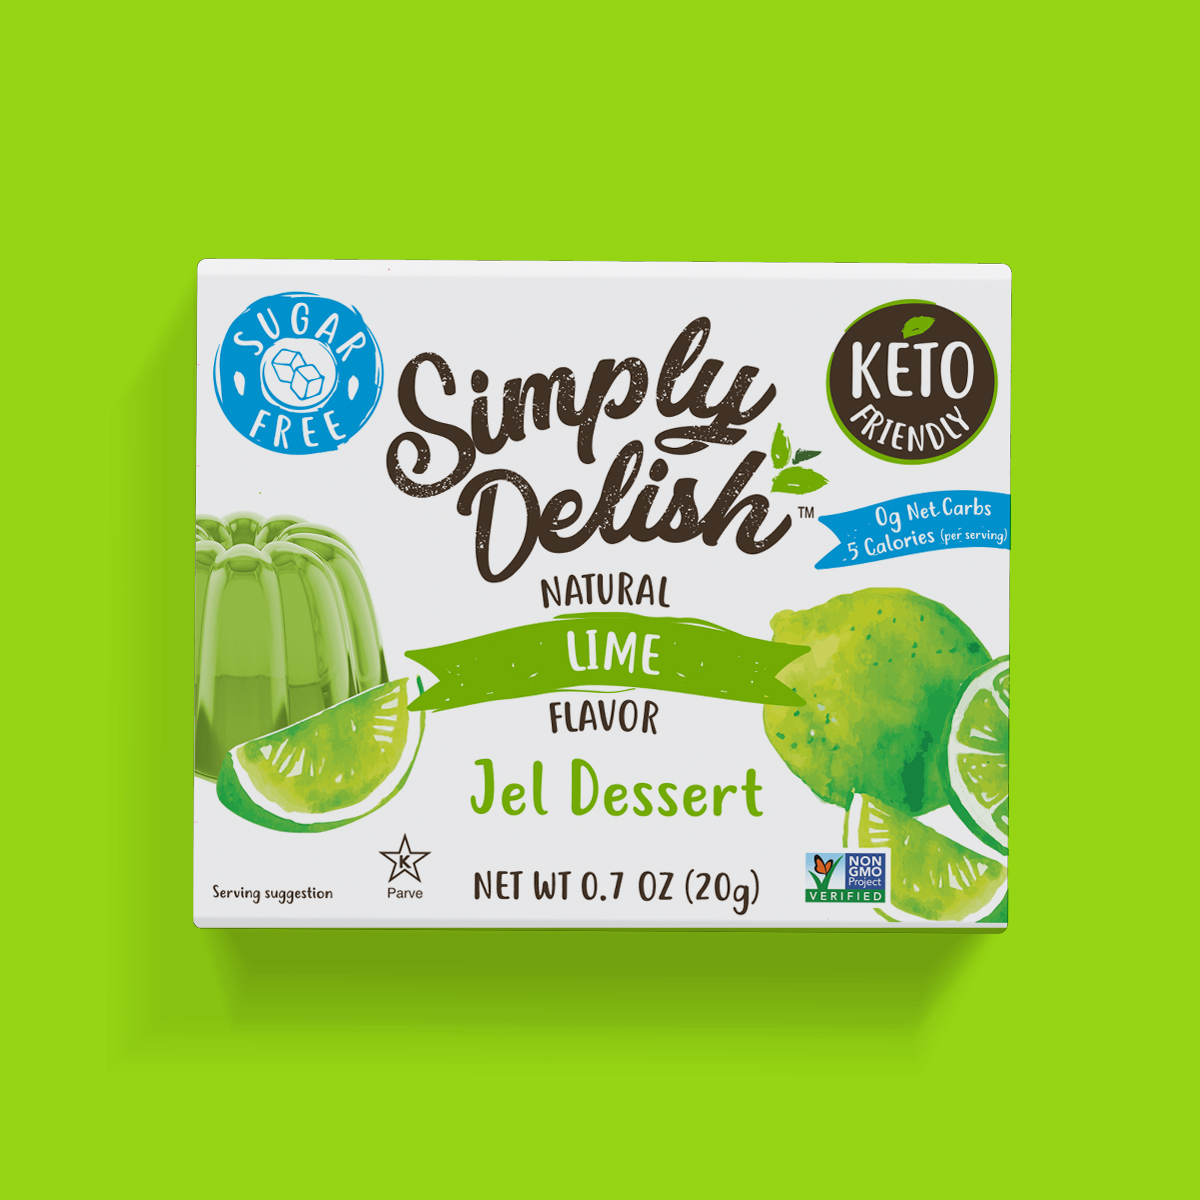 Keto Friendly Vegan Simply Delish Lime Jel